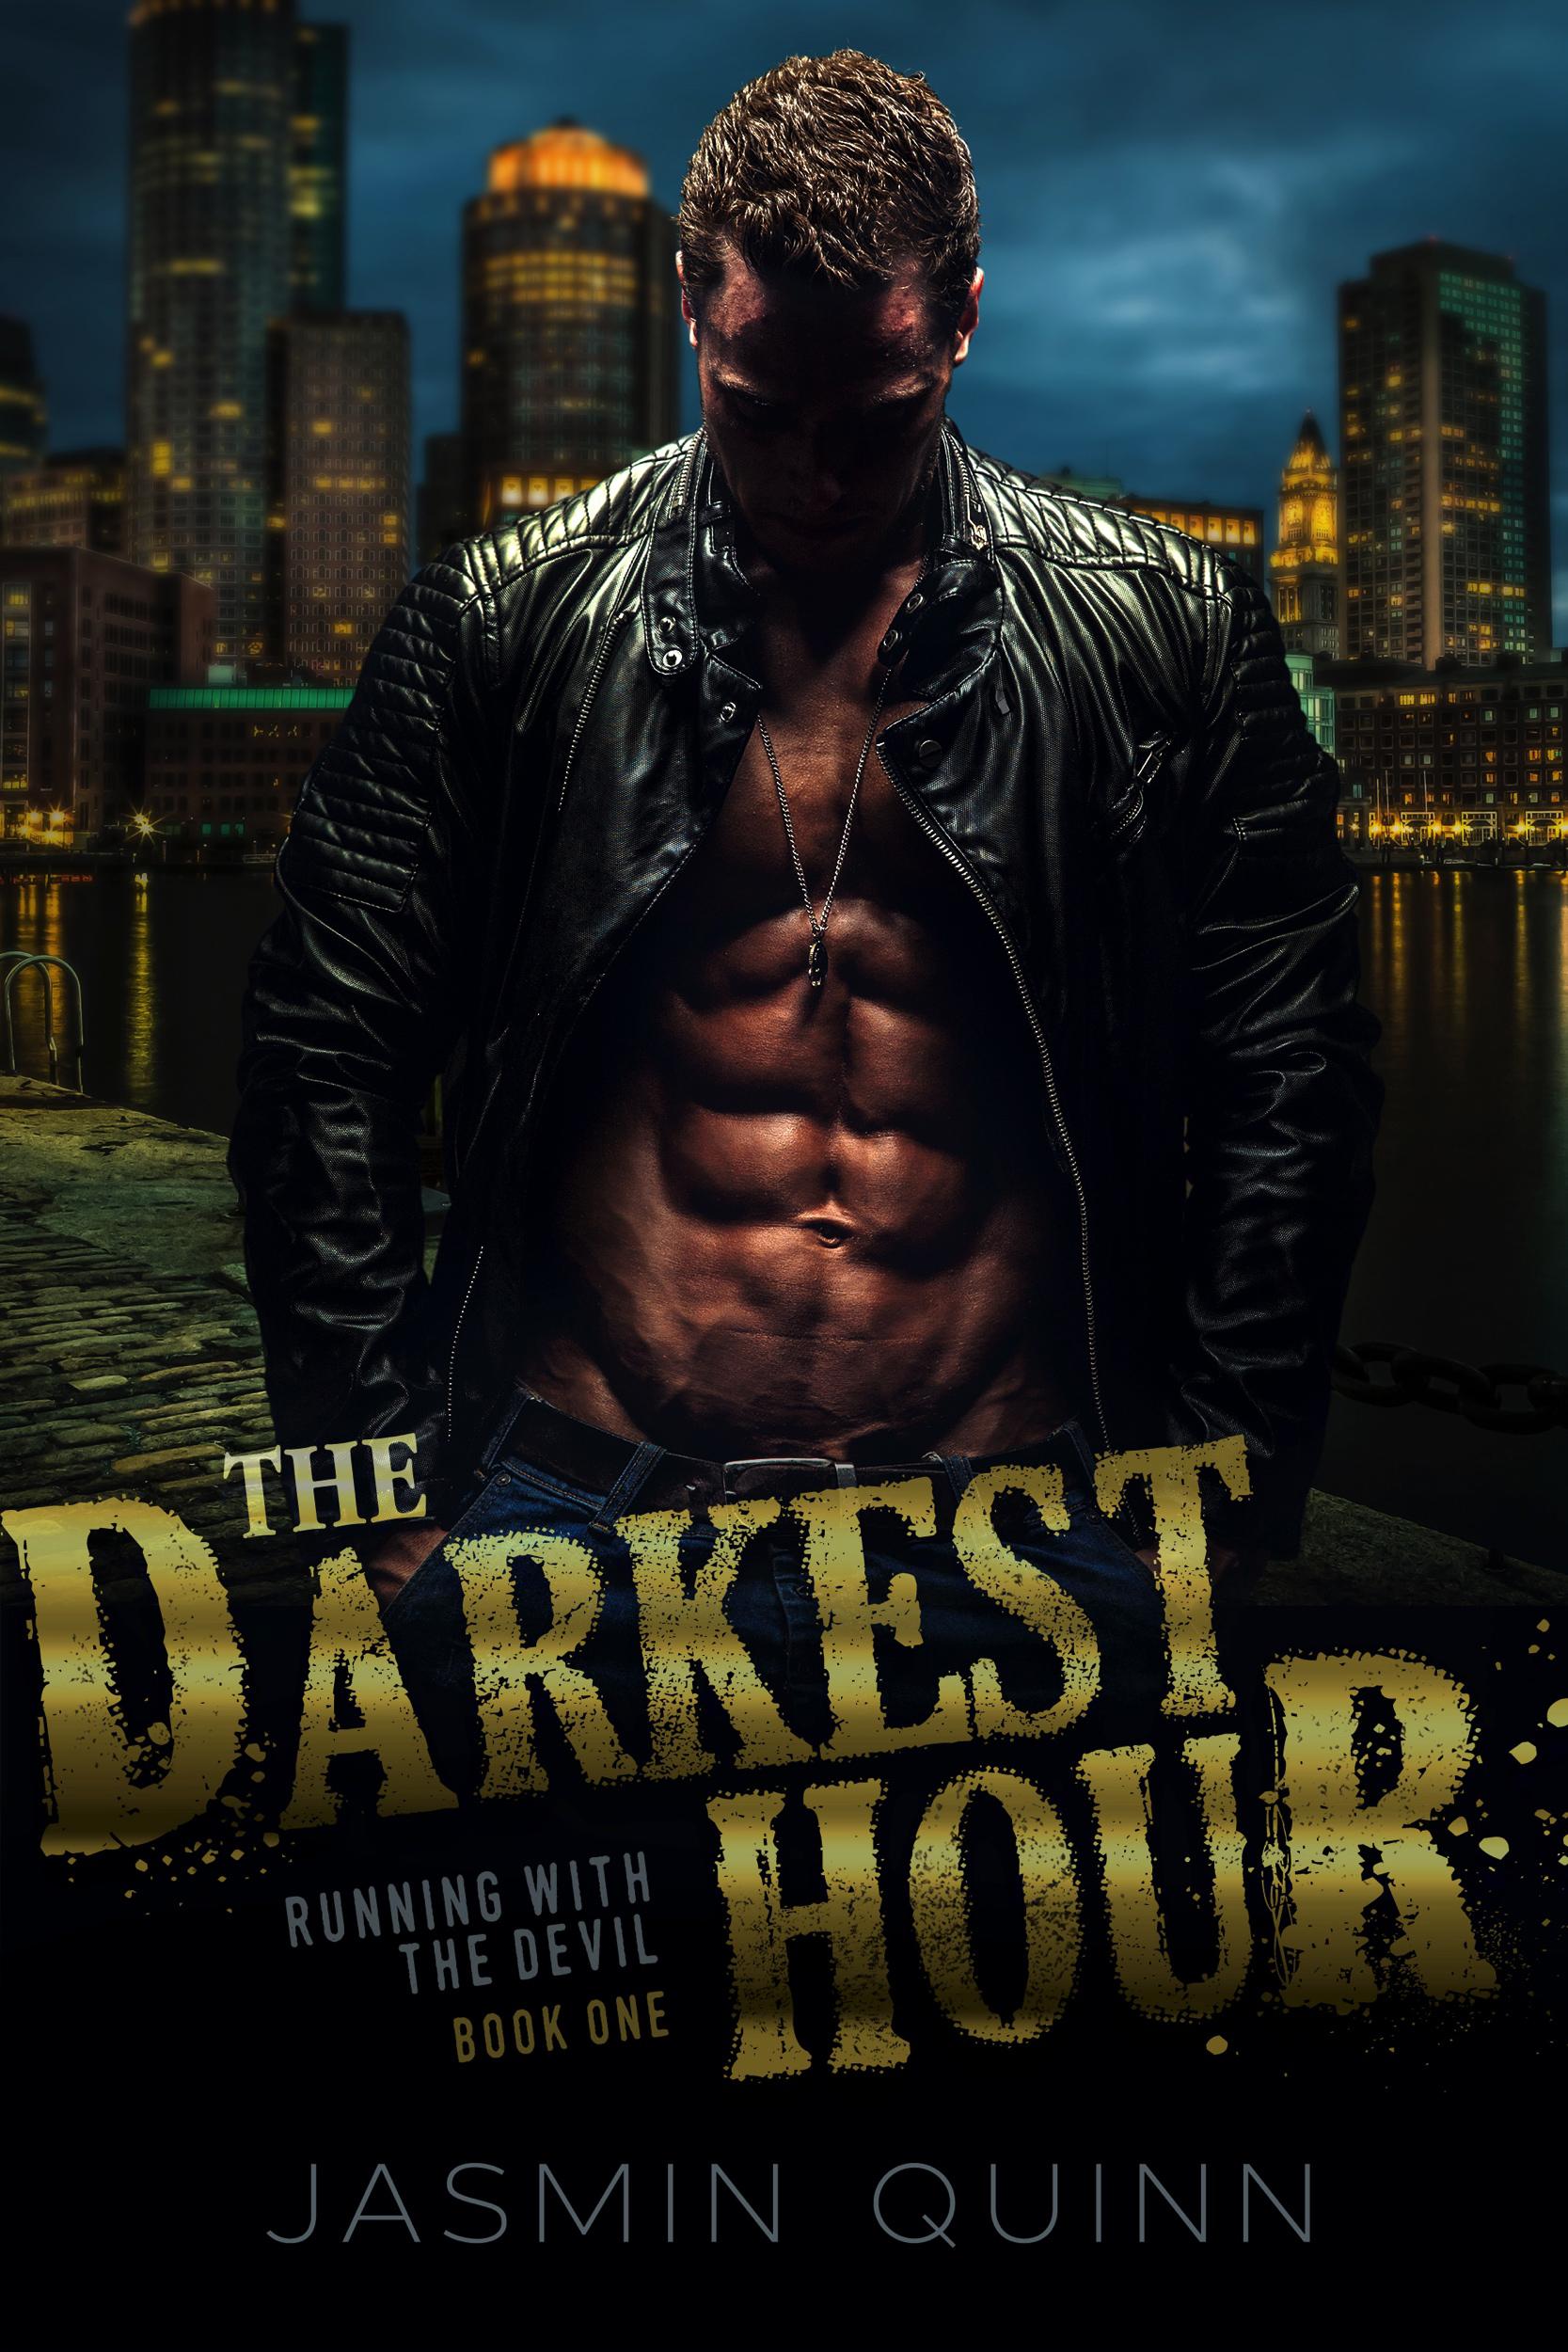 The-Darkest-Hour-Kindle